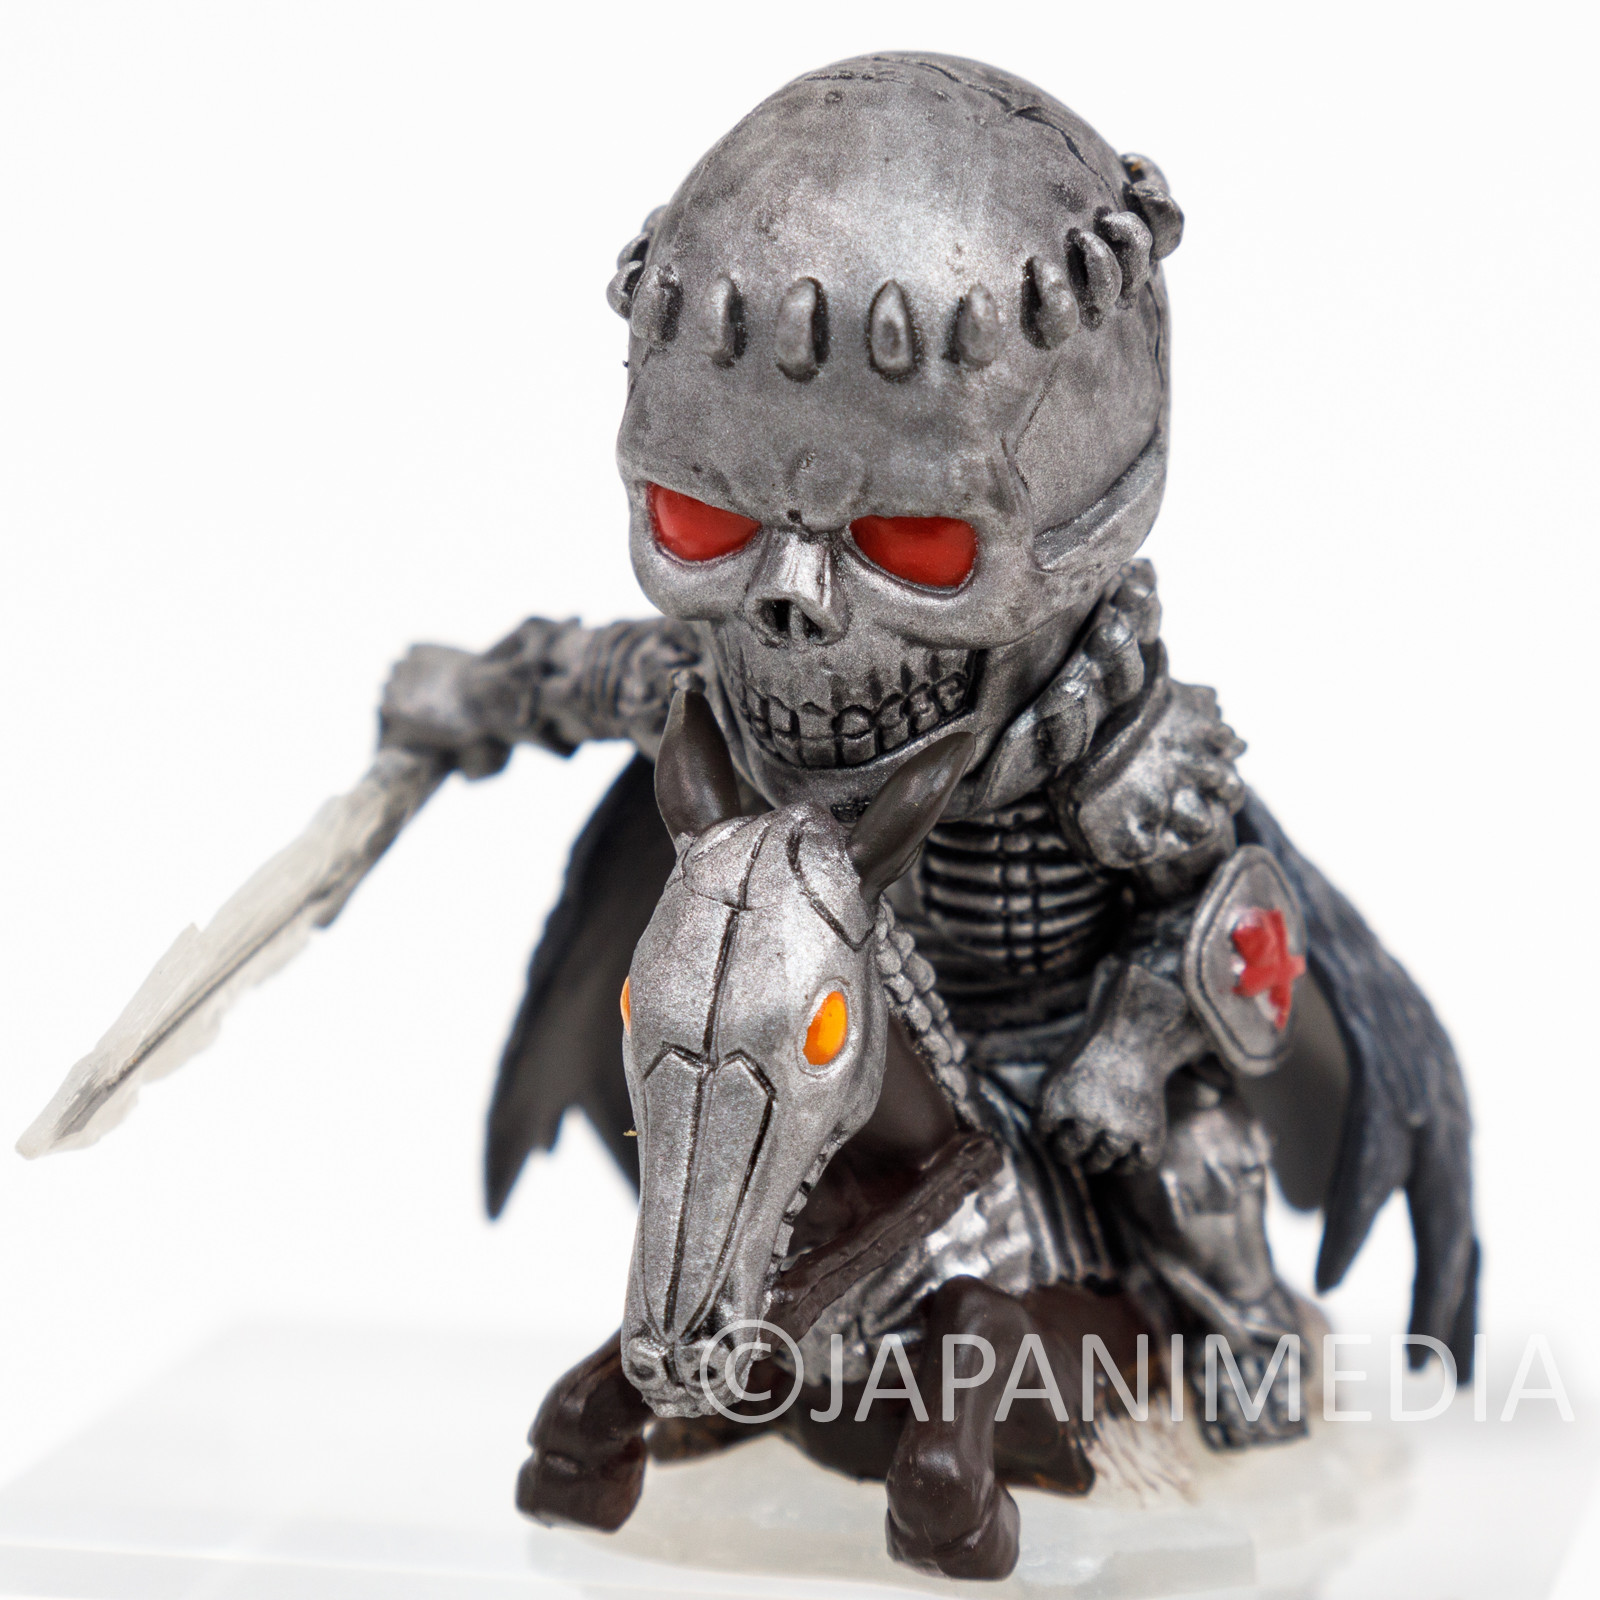 Berserk Skull Skeleton Knight Figure Collection JAPAN ANIME MANGA